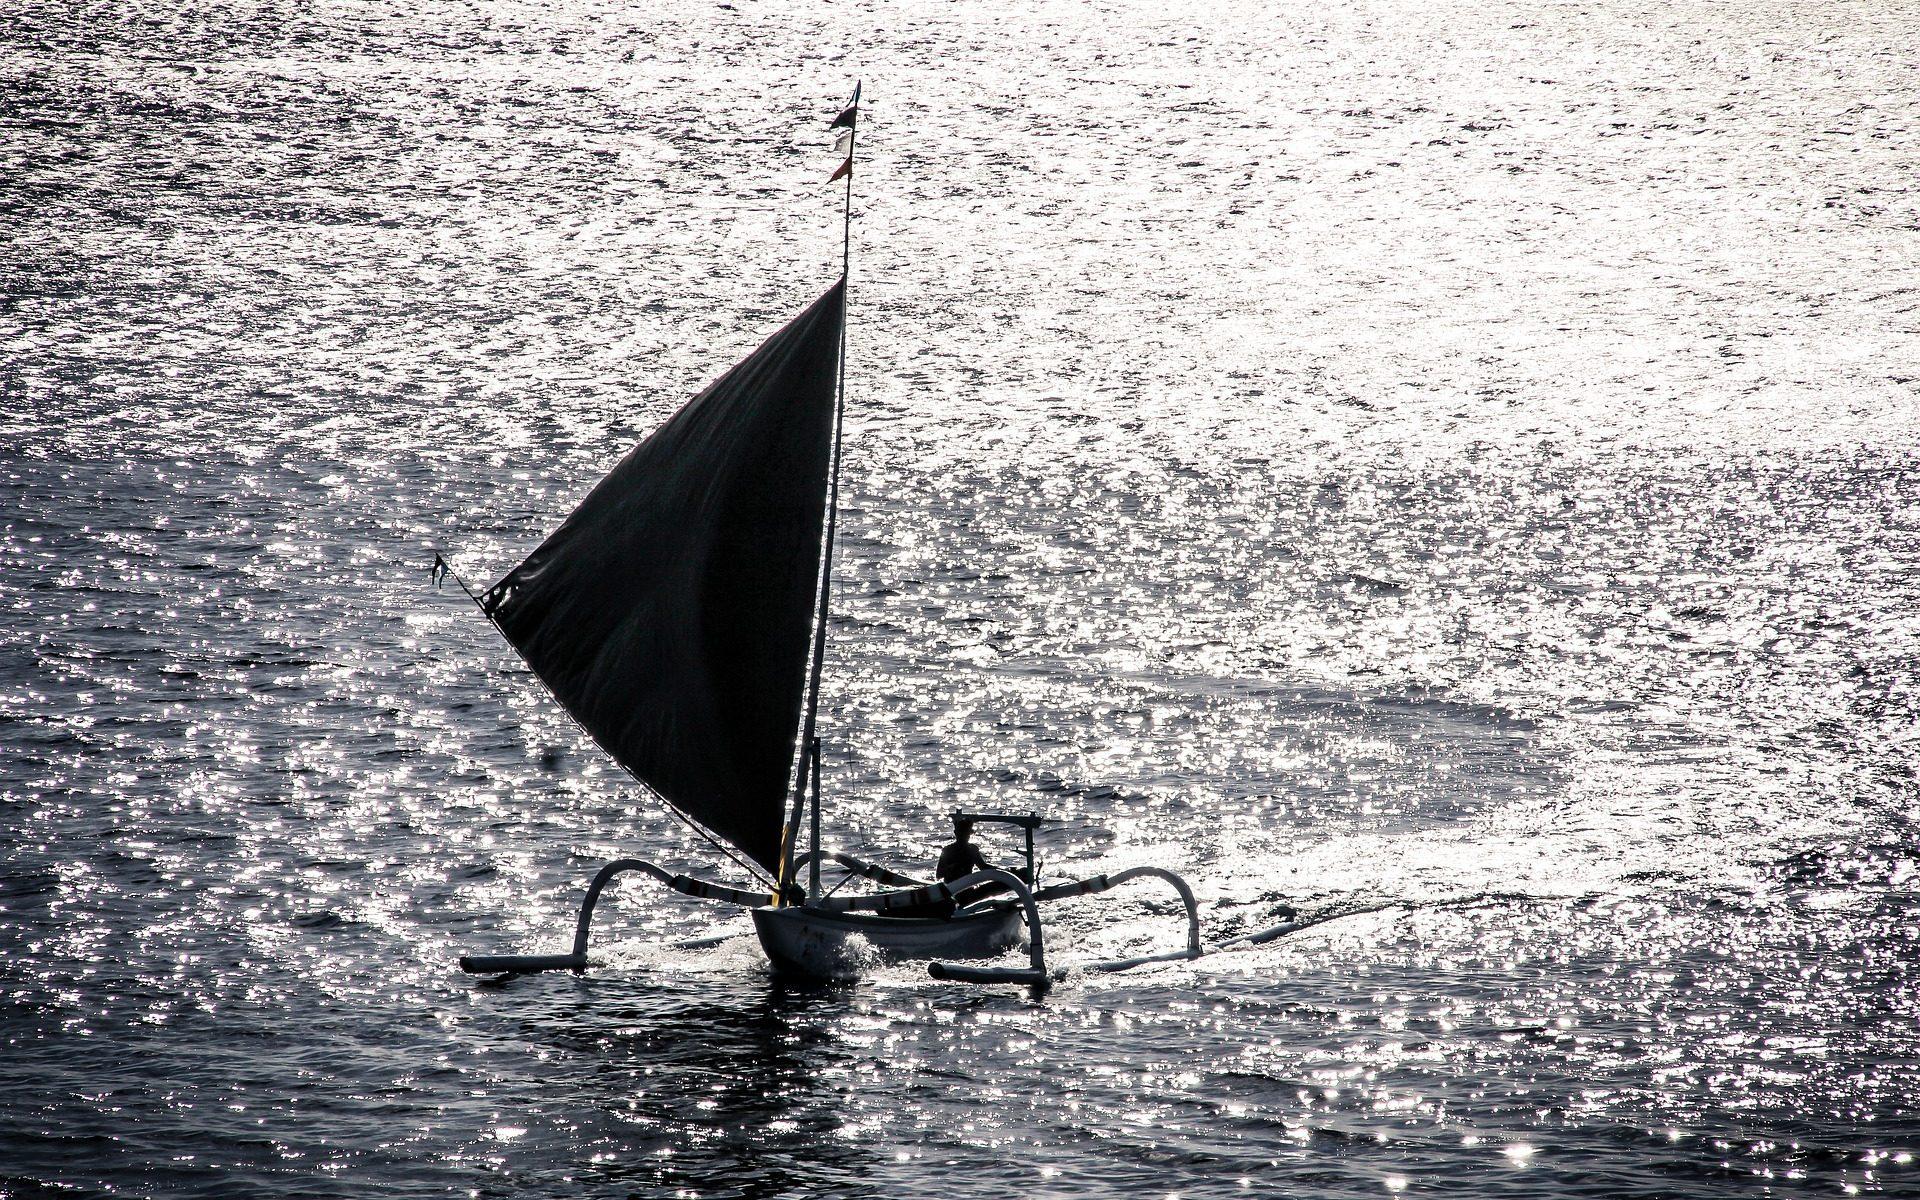 bali fisherman.boat  1920x1200 - Bali: Raus mit den Fishermen